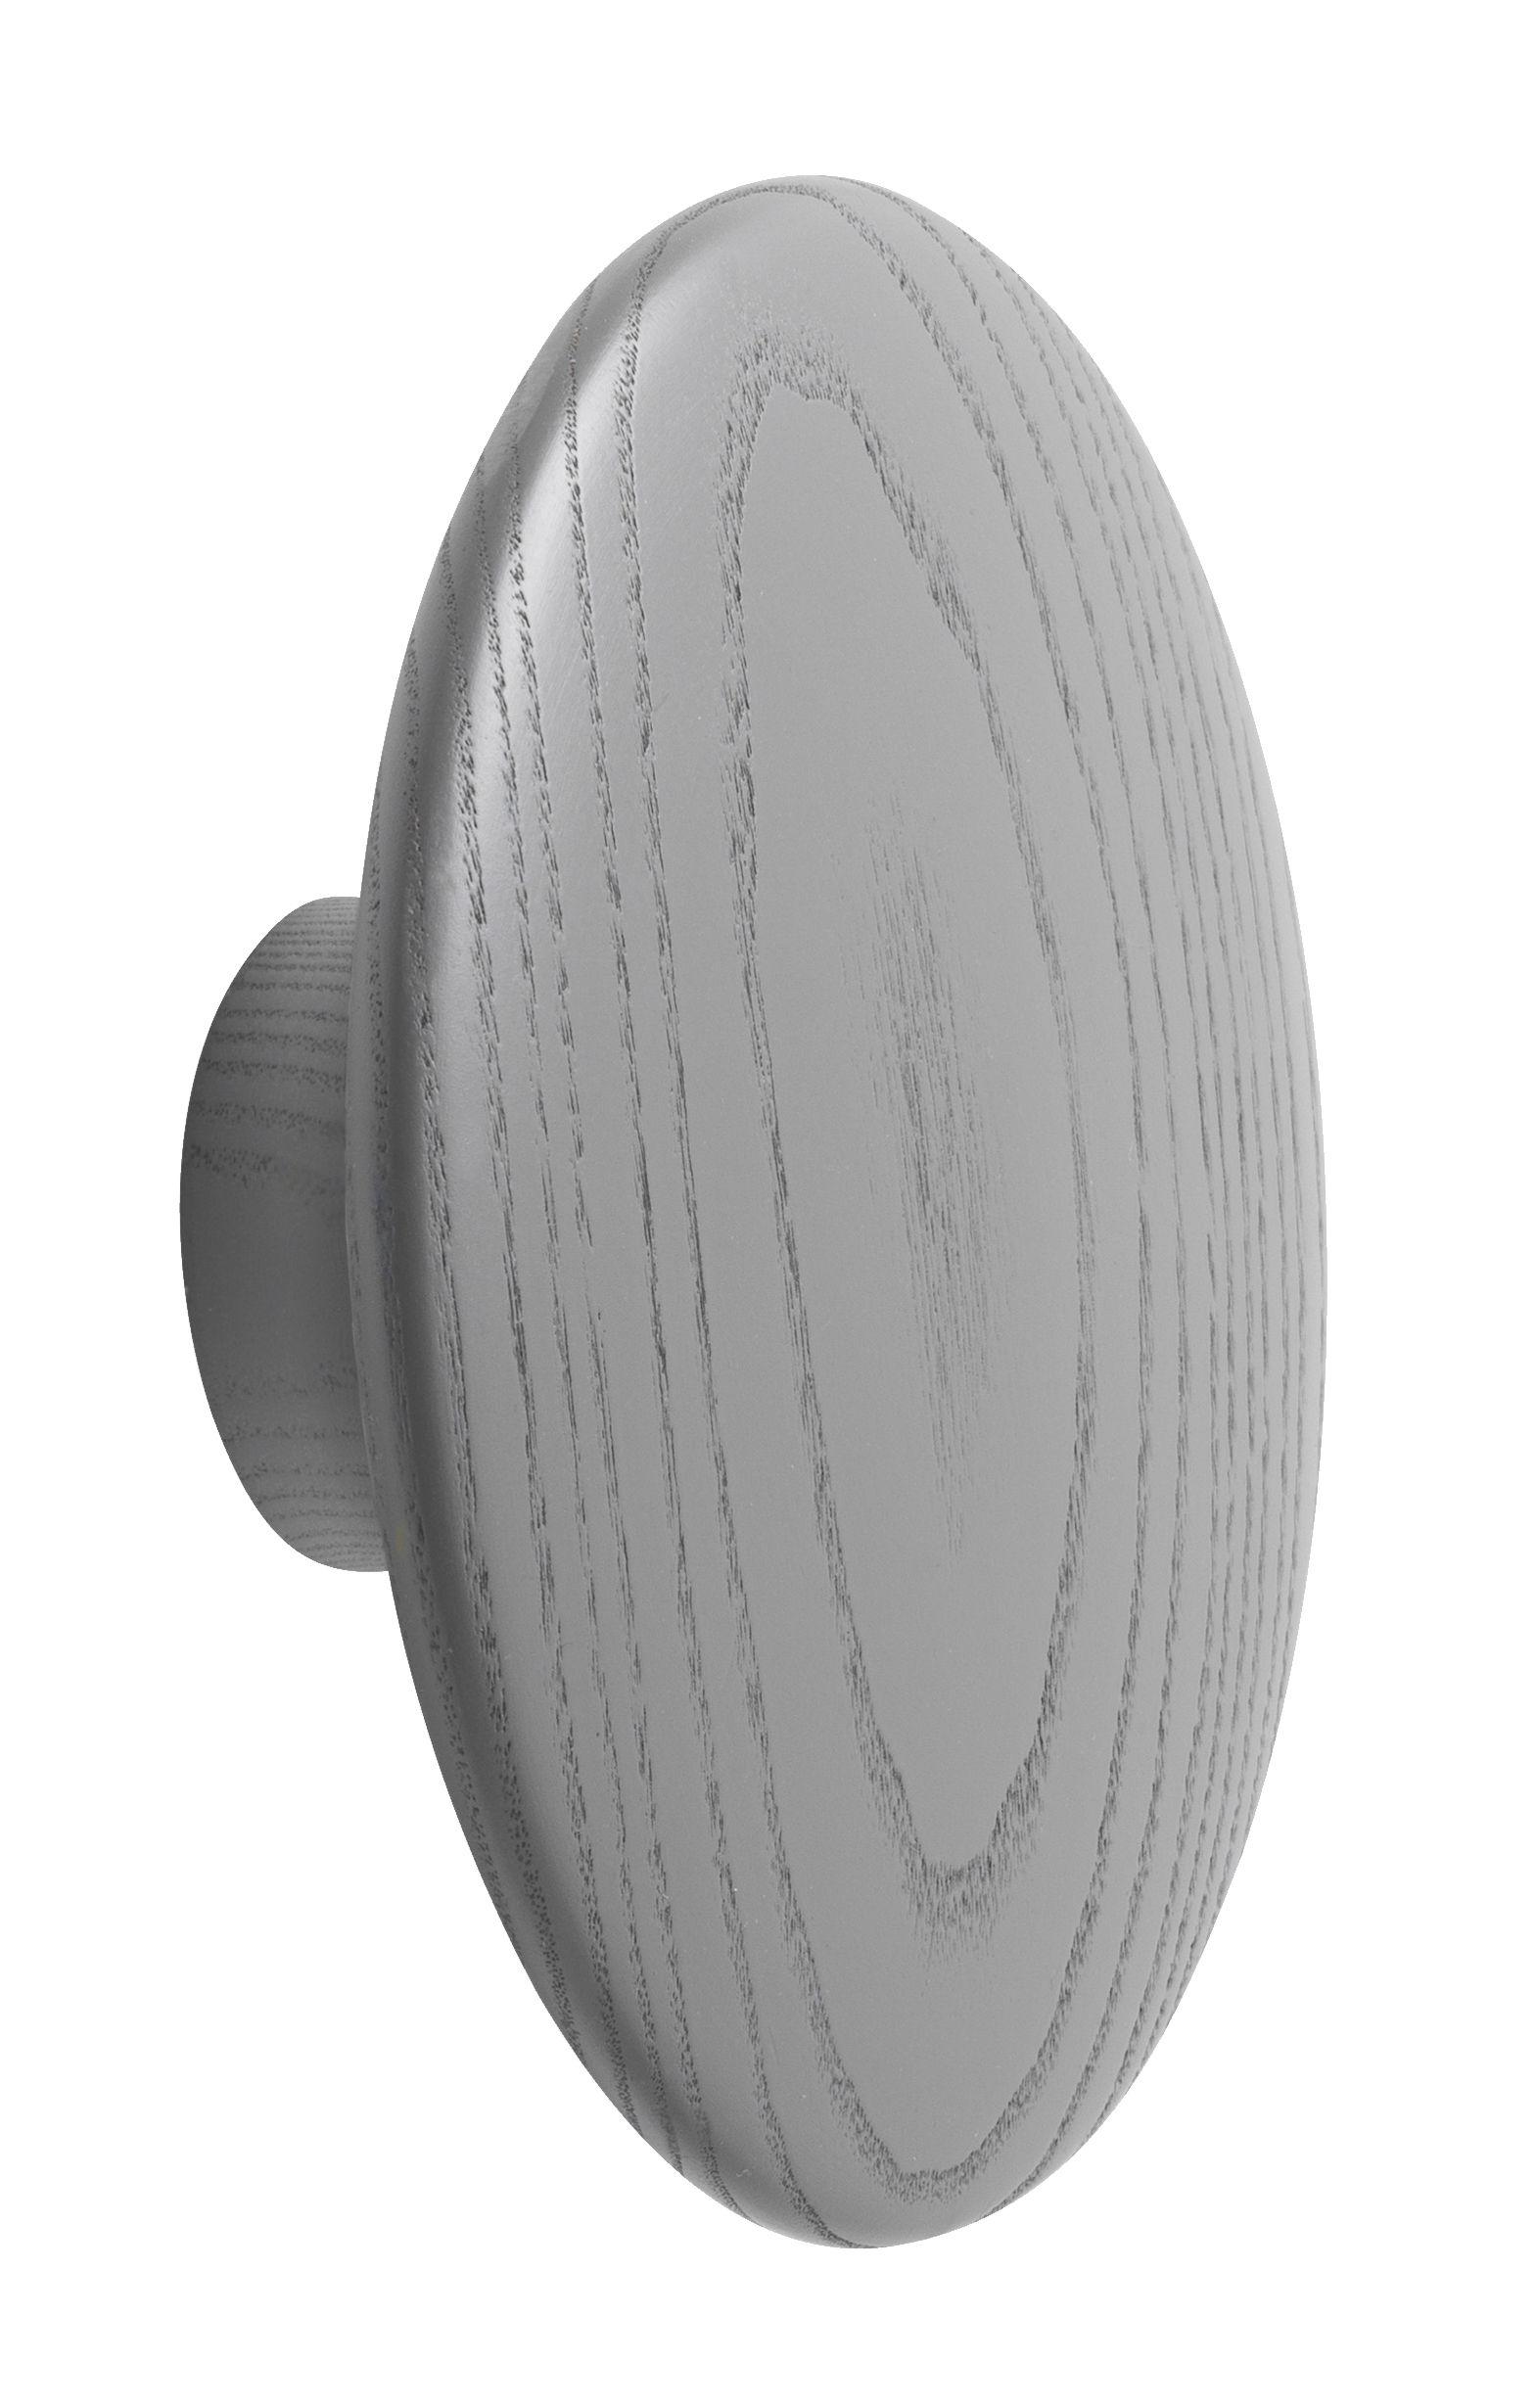 Arredamento - Appendiabiti  - Gancio The dots / Large - Ø 17 cm - Muuto - Grigio scuro - Frassino tinto